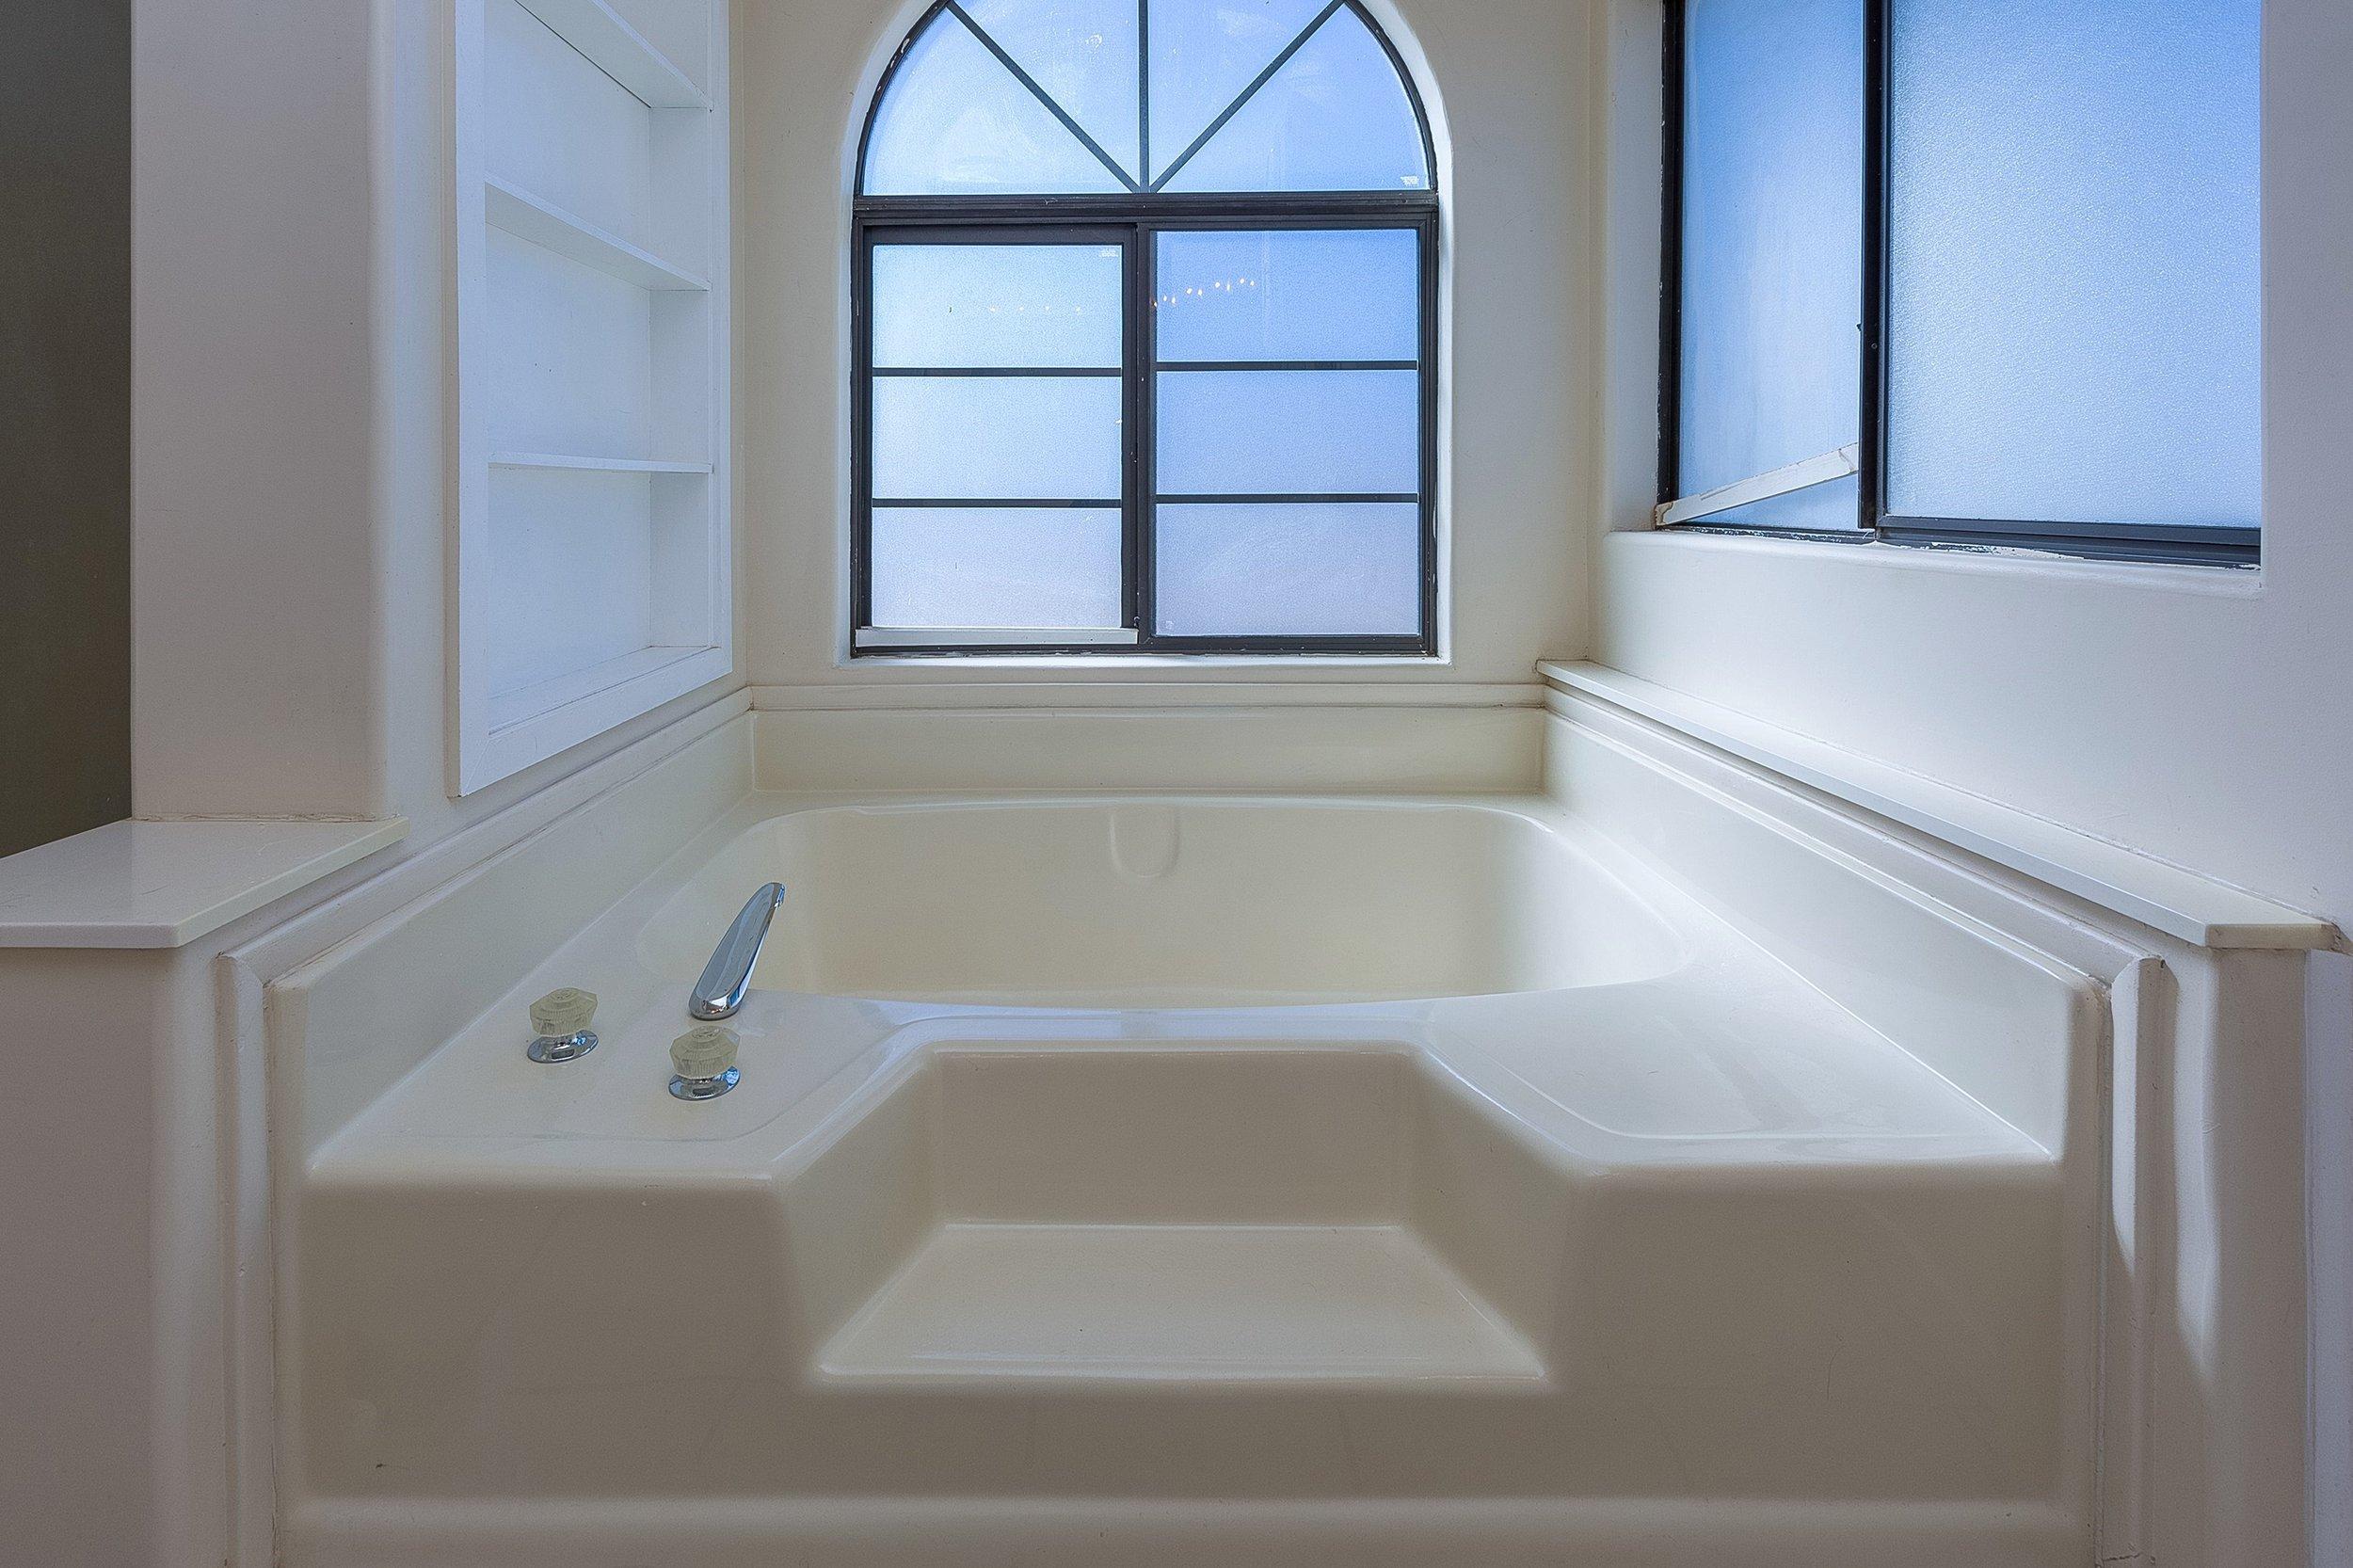 028_Master Bathroom .jpg